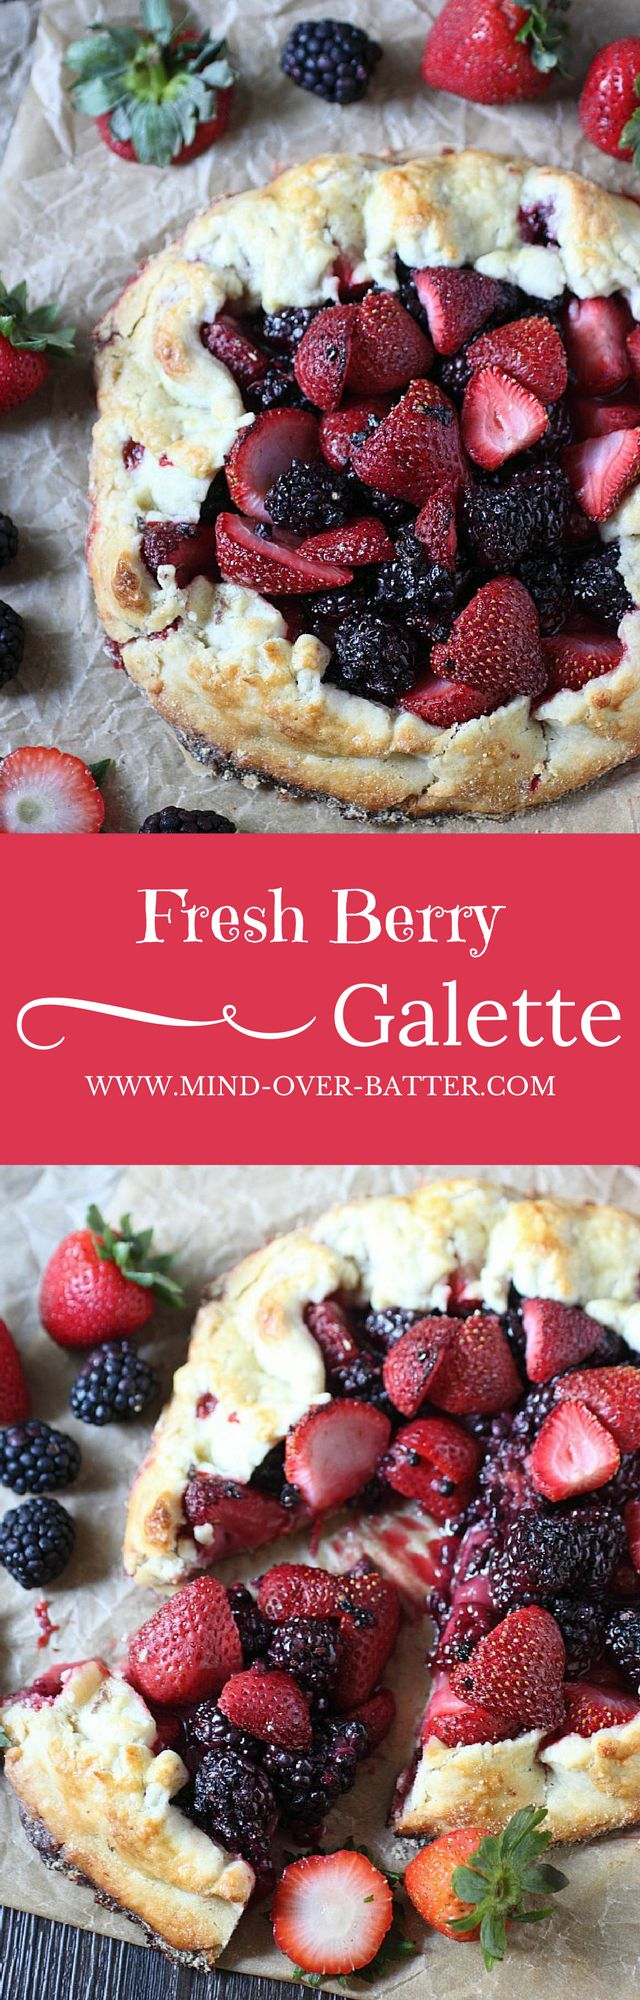 Fresh Berry Galette --- www.mind-over-batter.com